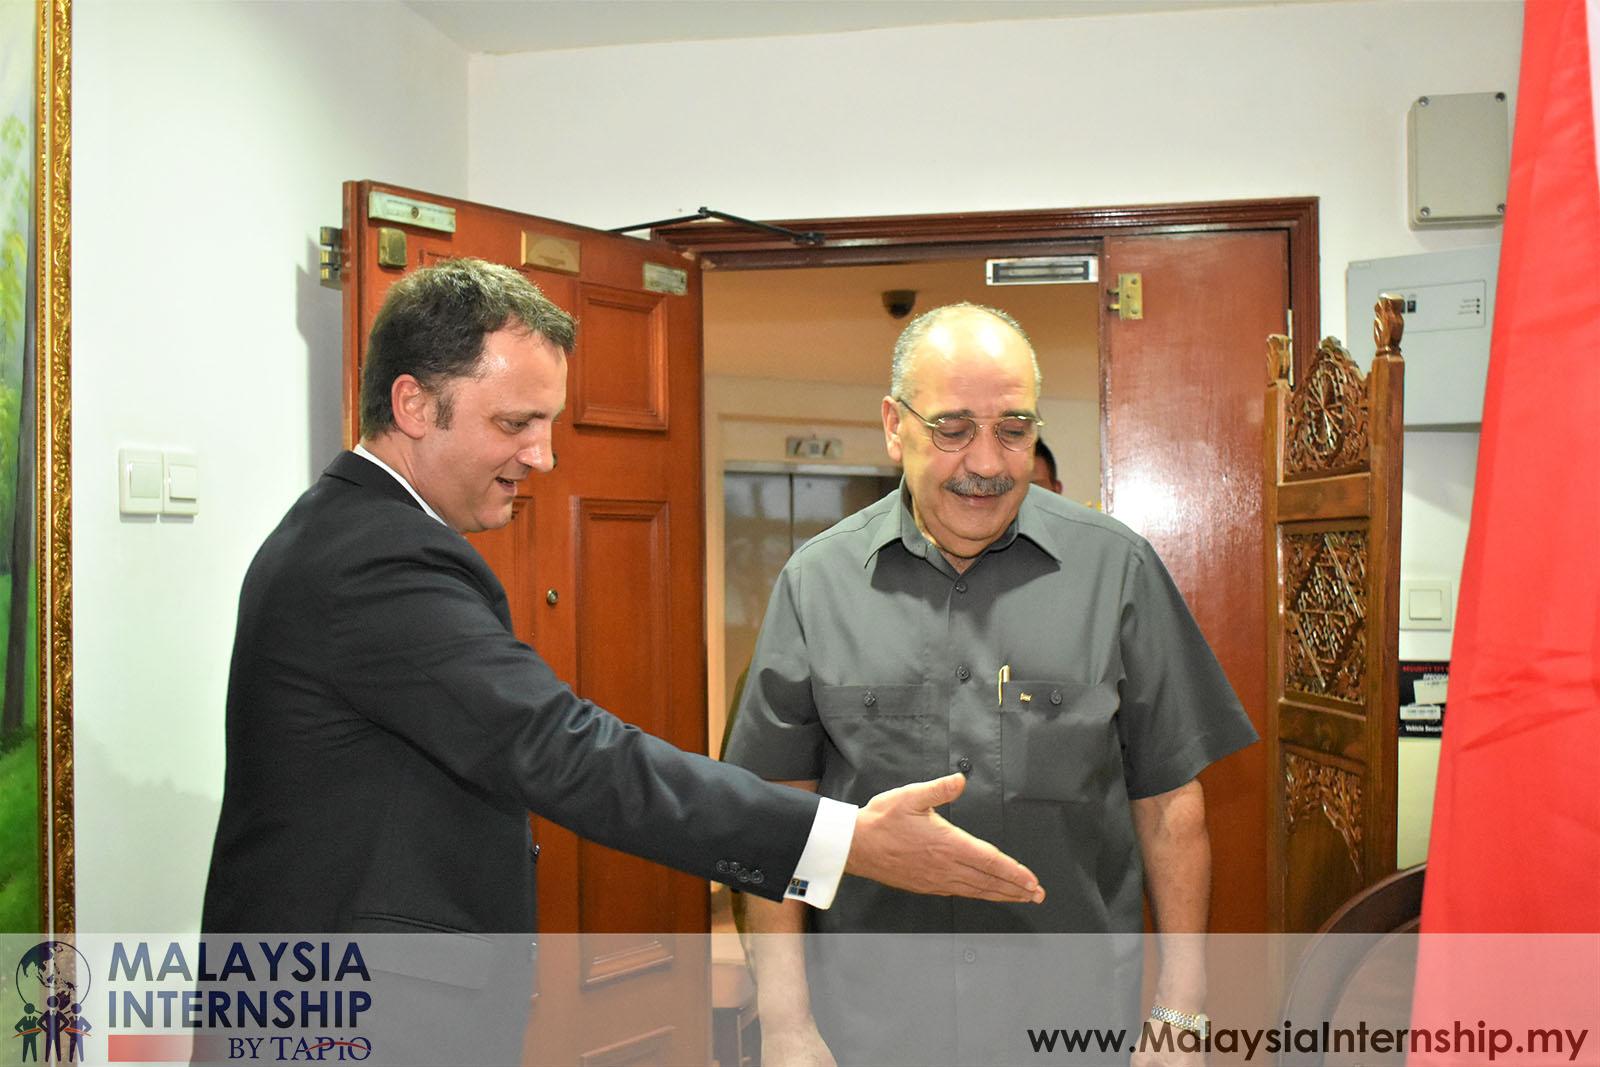 Wednesday Club with H.E Ambassador Walid Abu Ali - 09/05/2019